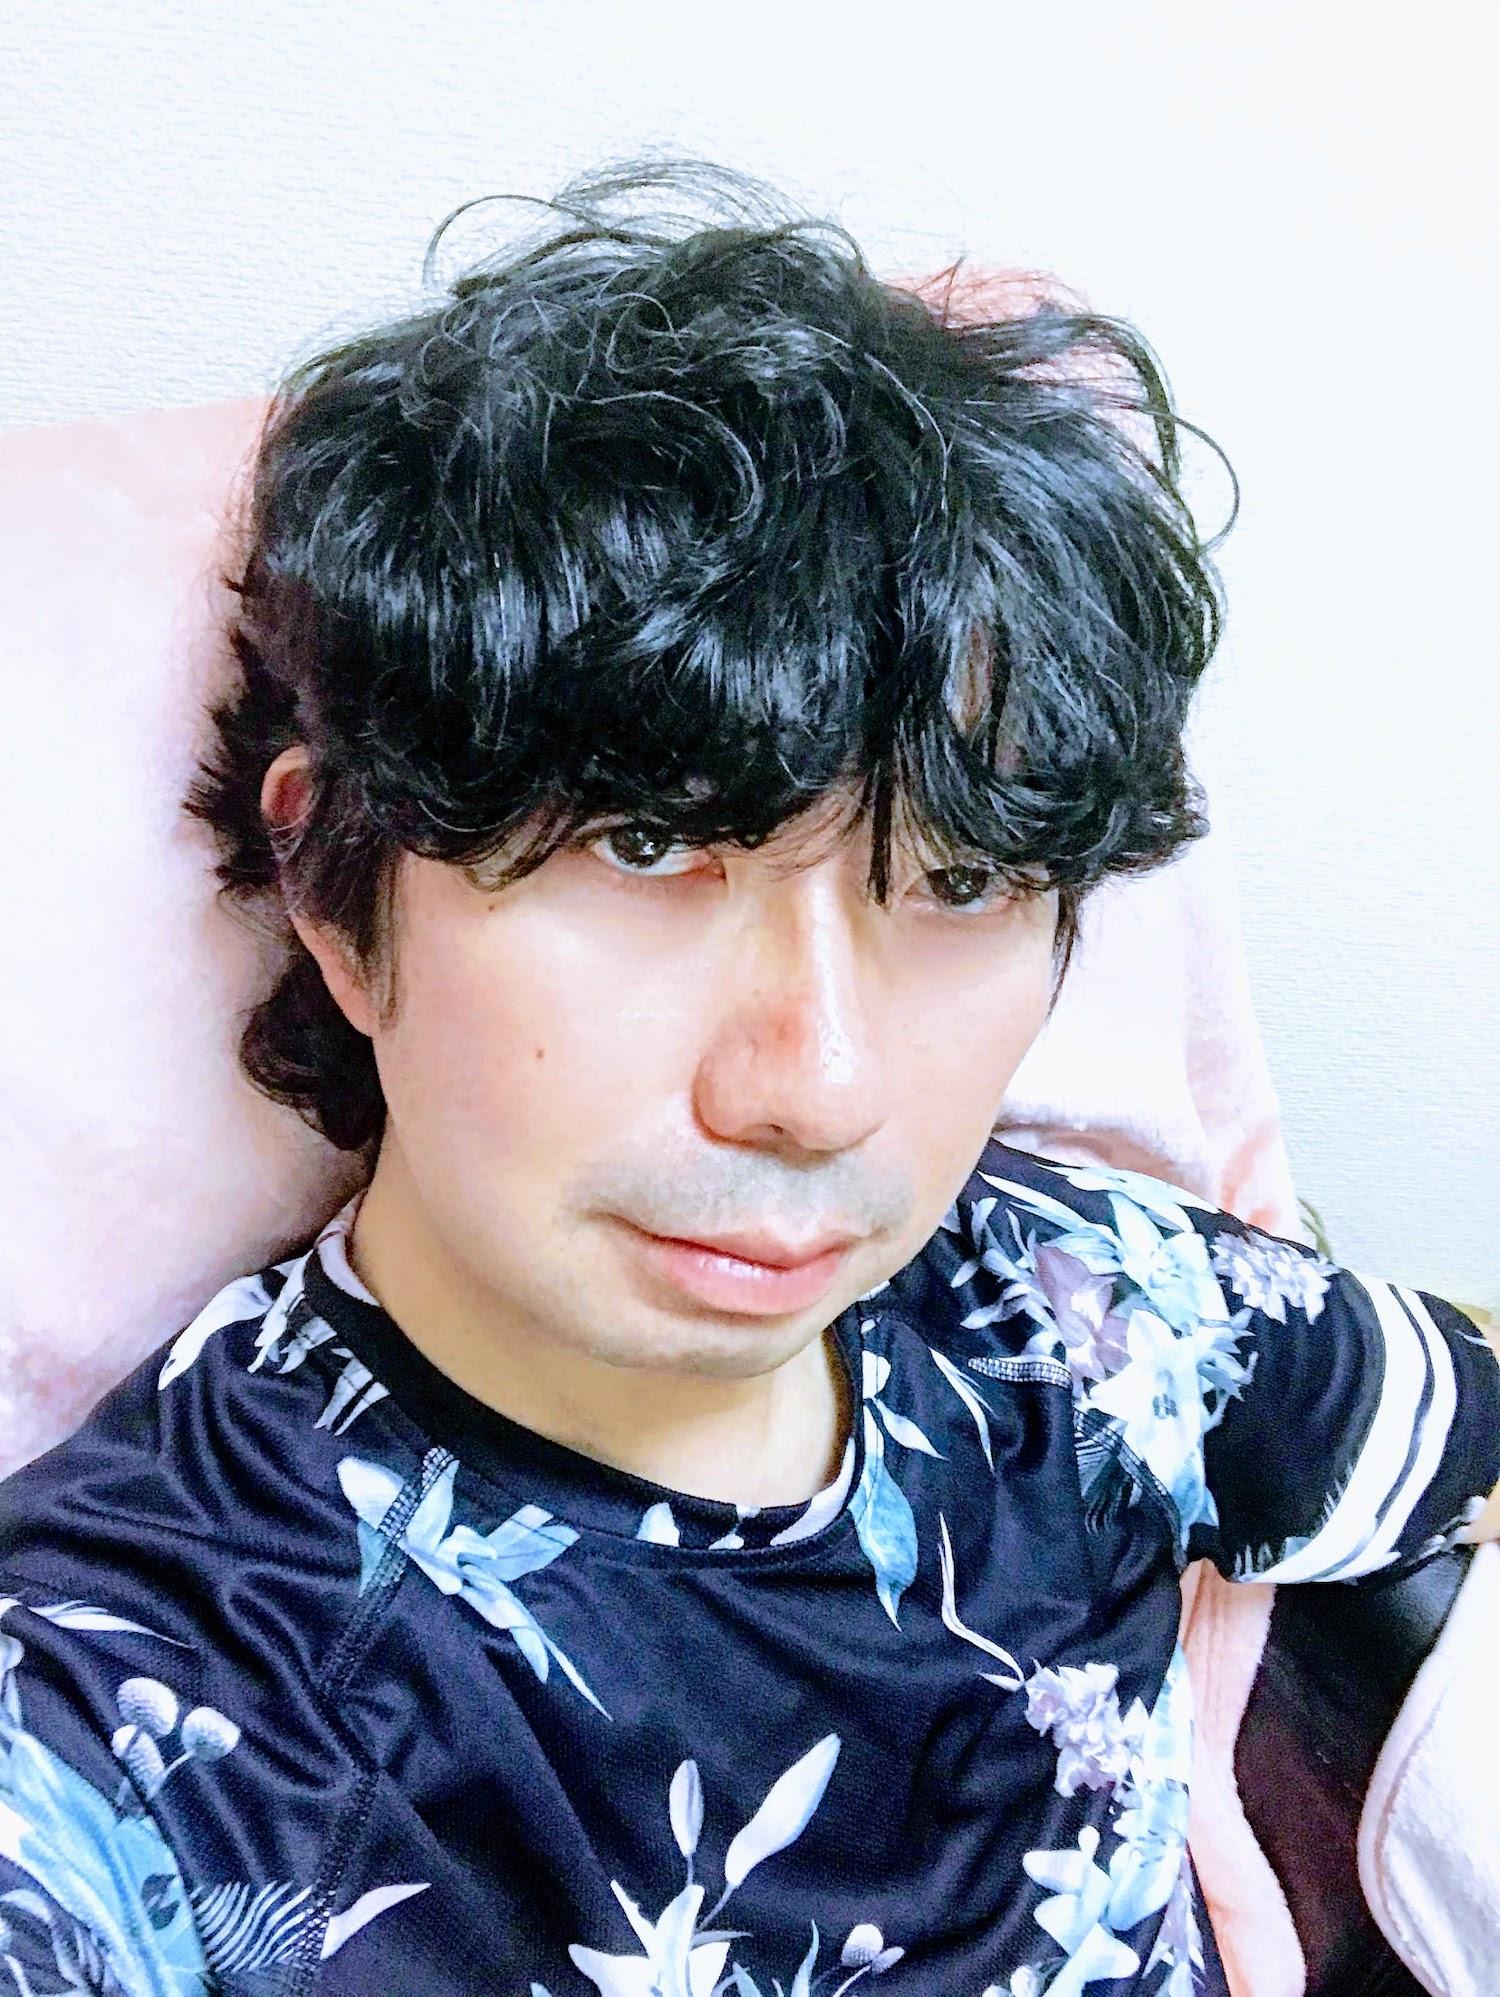 SHUN ONLINE(樺澤俊悟)/2019年5月11日